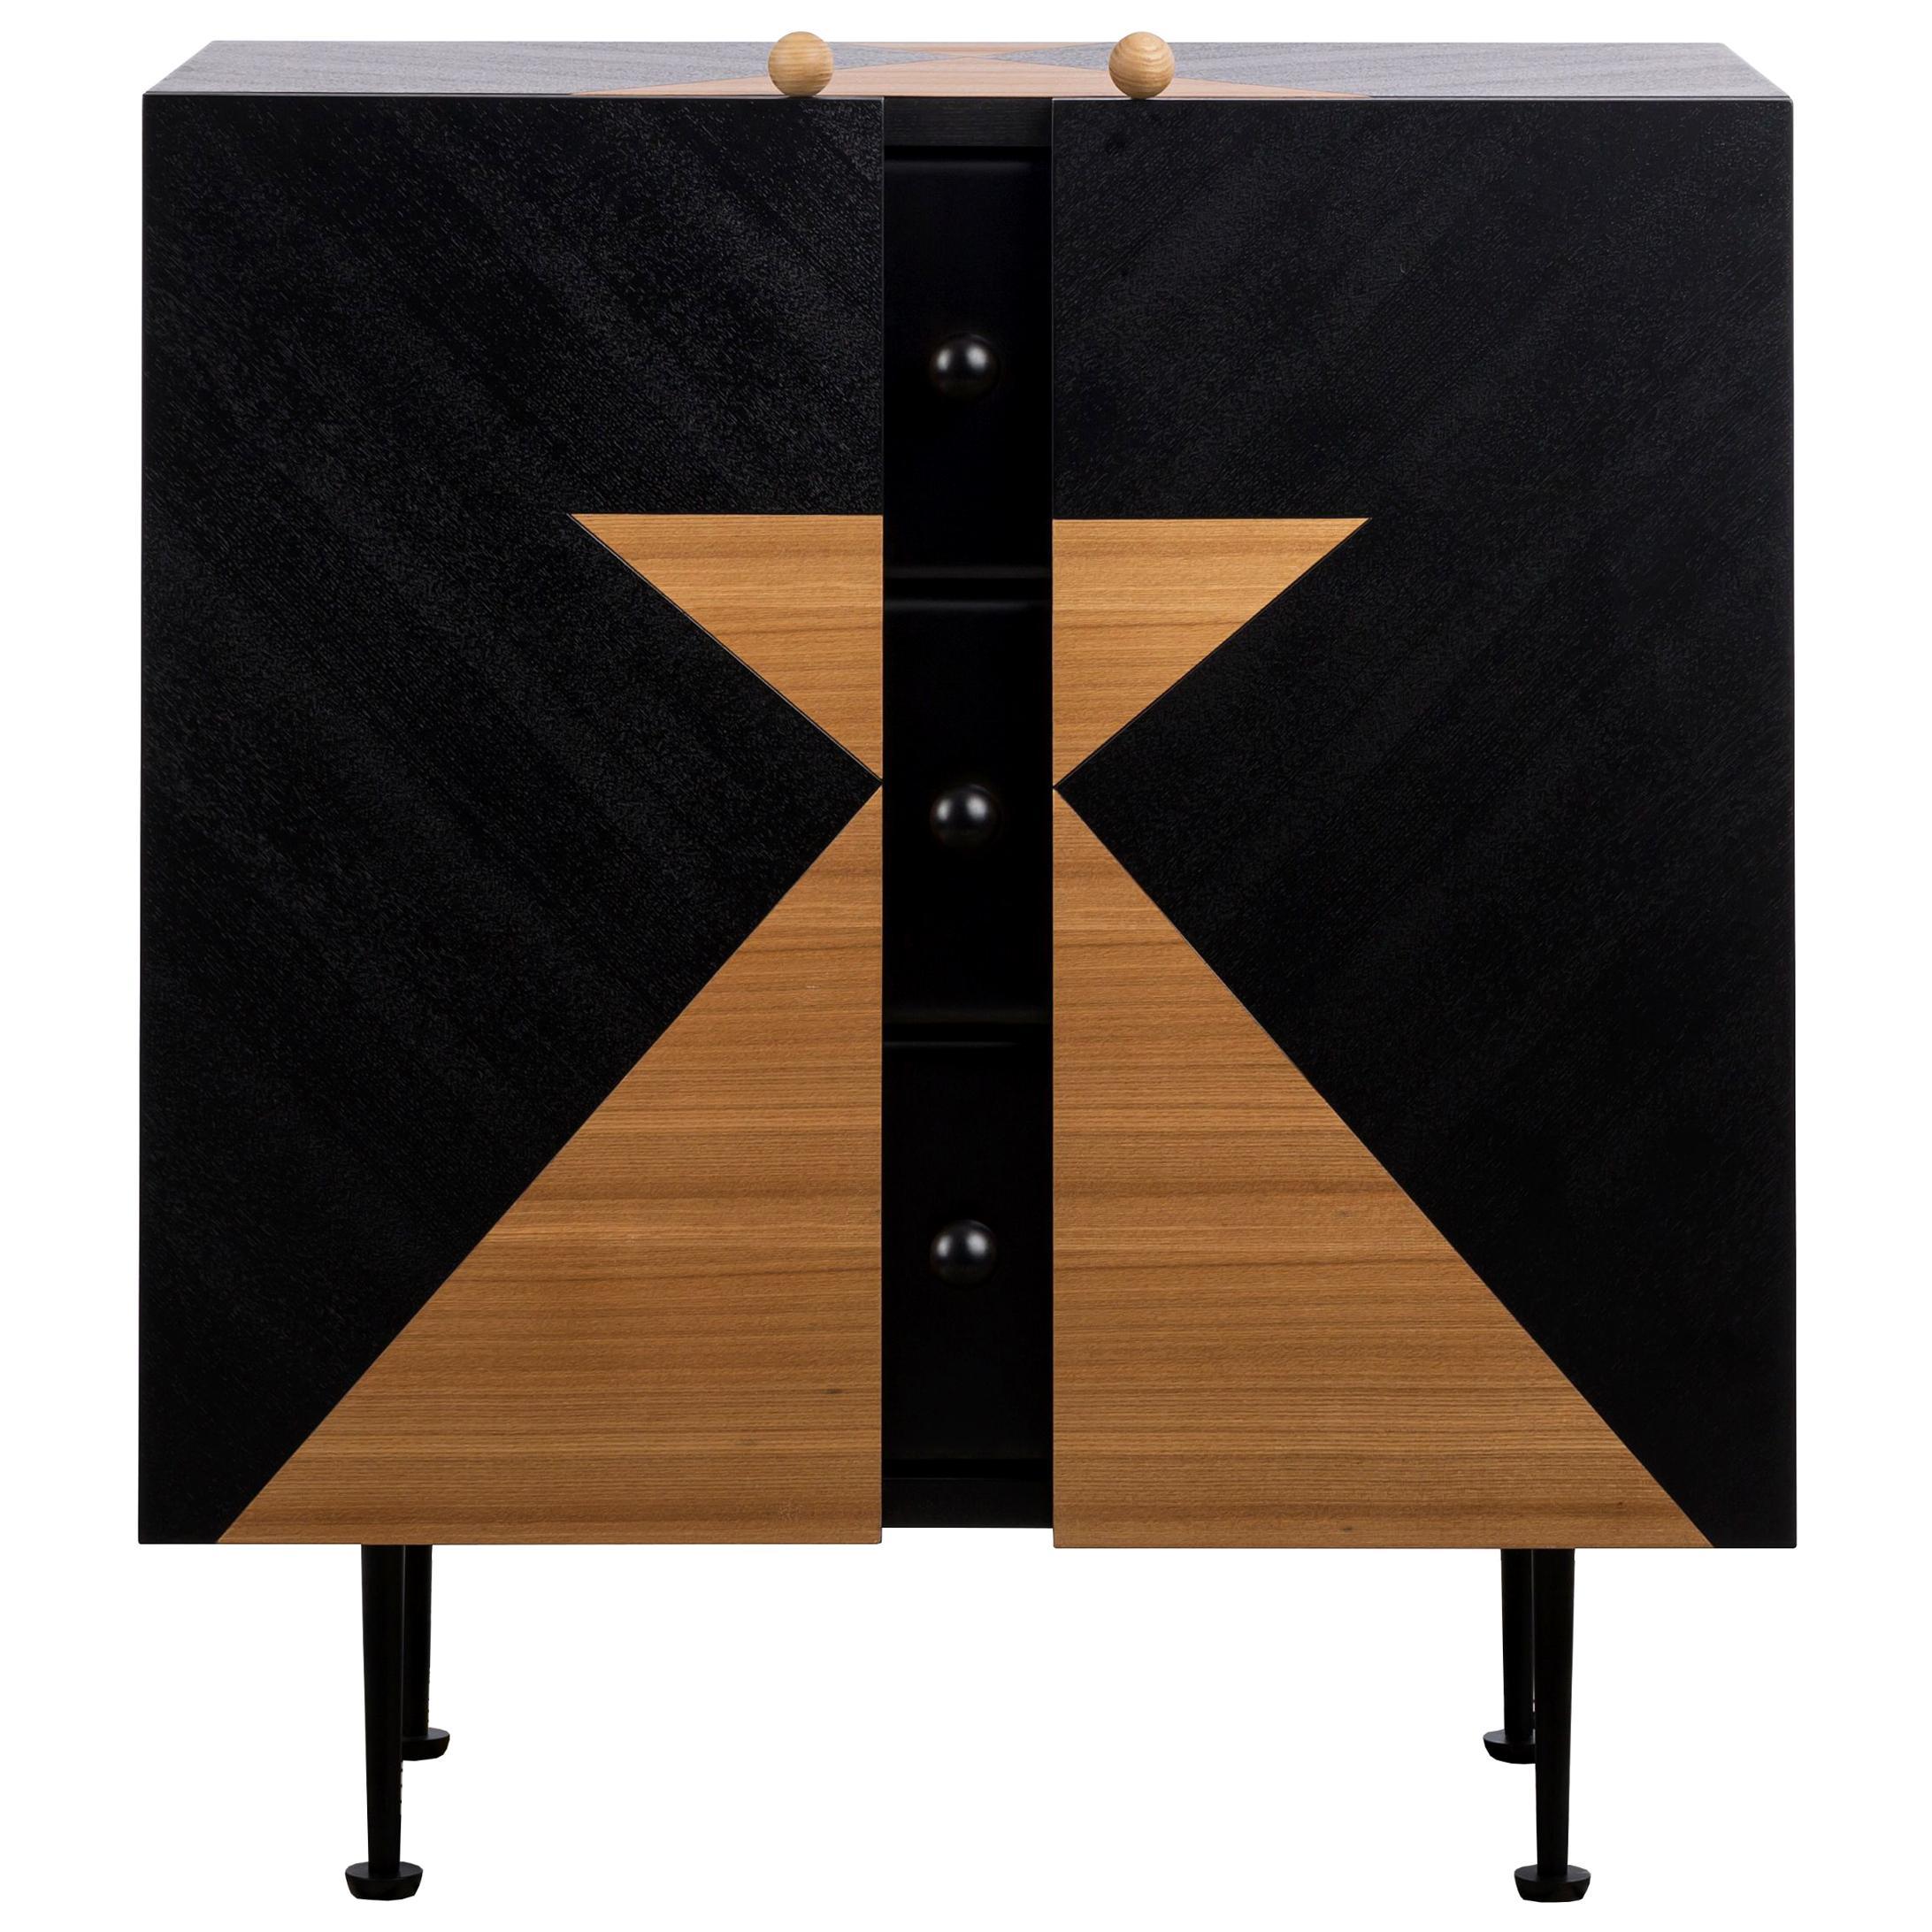 Yin-Yang Chest Drawers Designed by Thomas Dariel